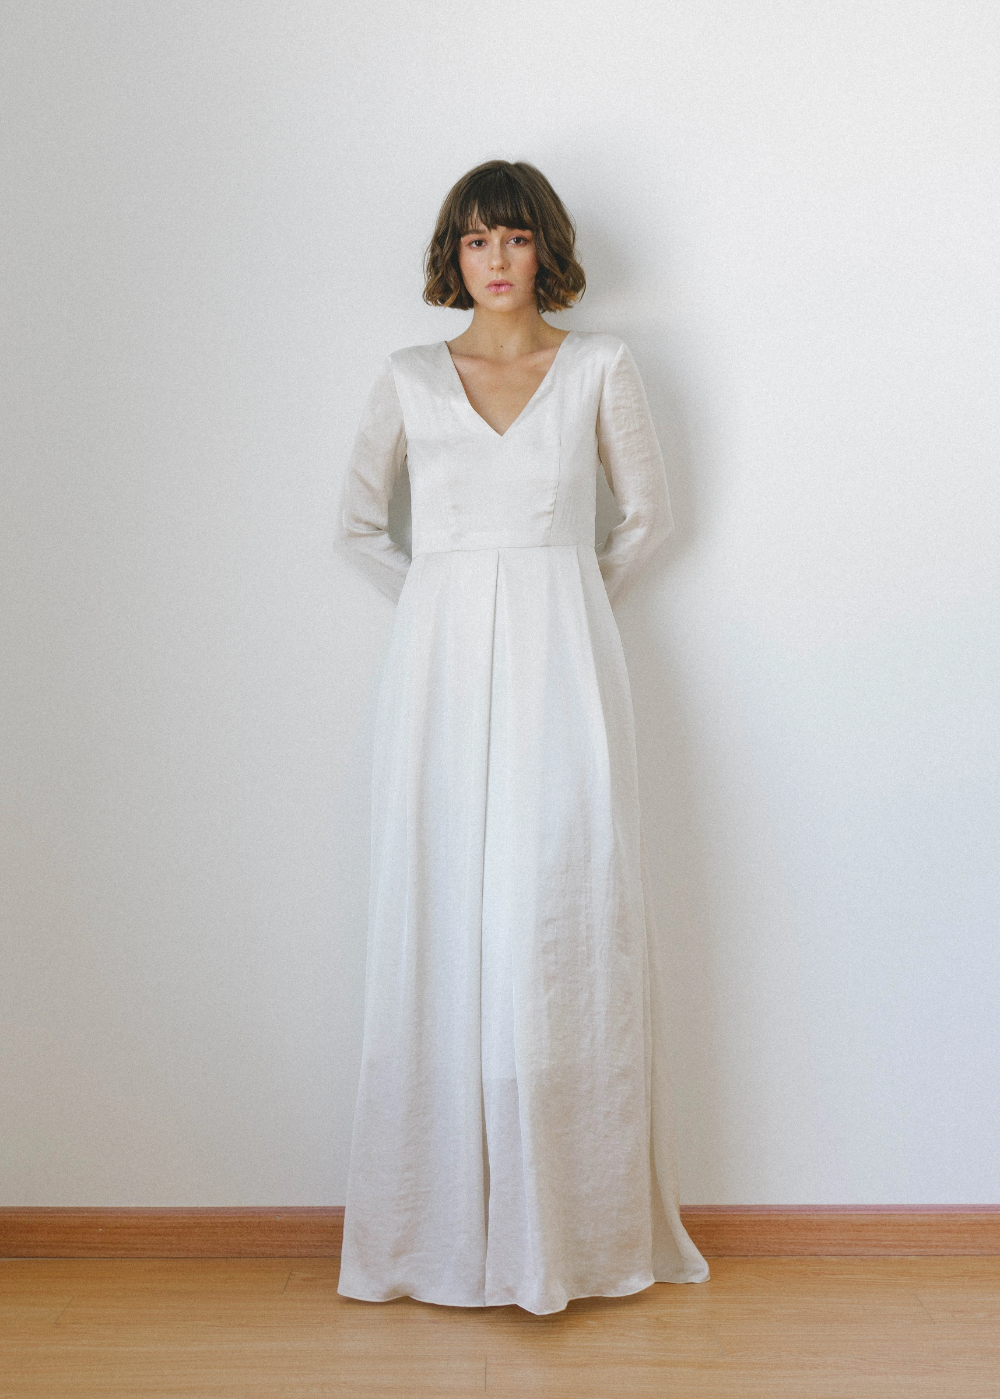 Lorette Long Sleeves Satin Wedding Dress Long Sleeve Satin Wedding Dress Dresses Long Sleeve Satin Dress [ 1399 x 1000 Pixel ]